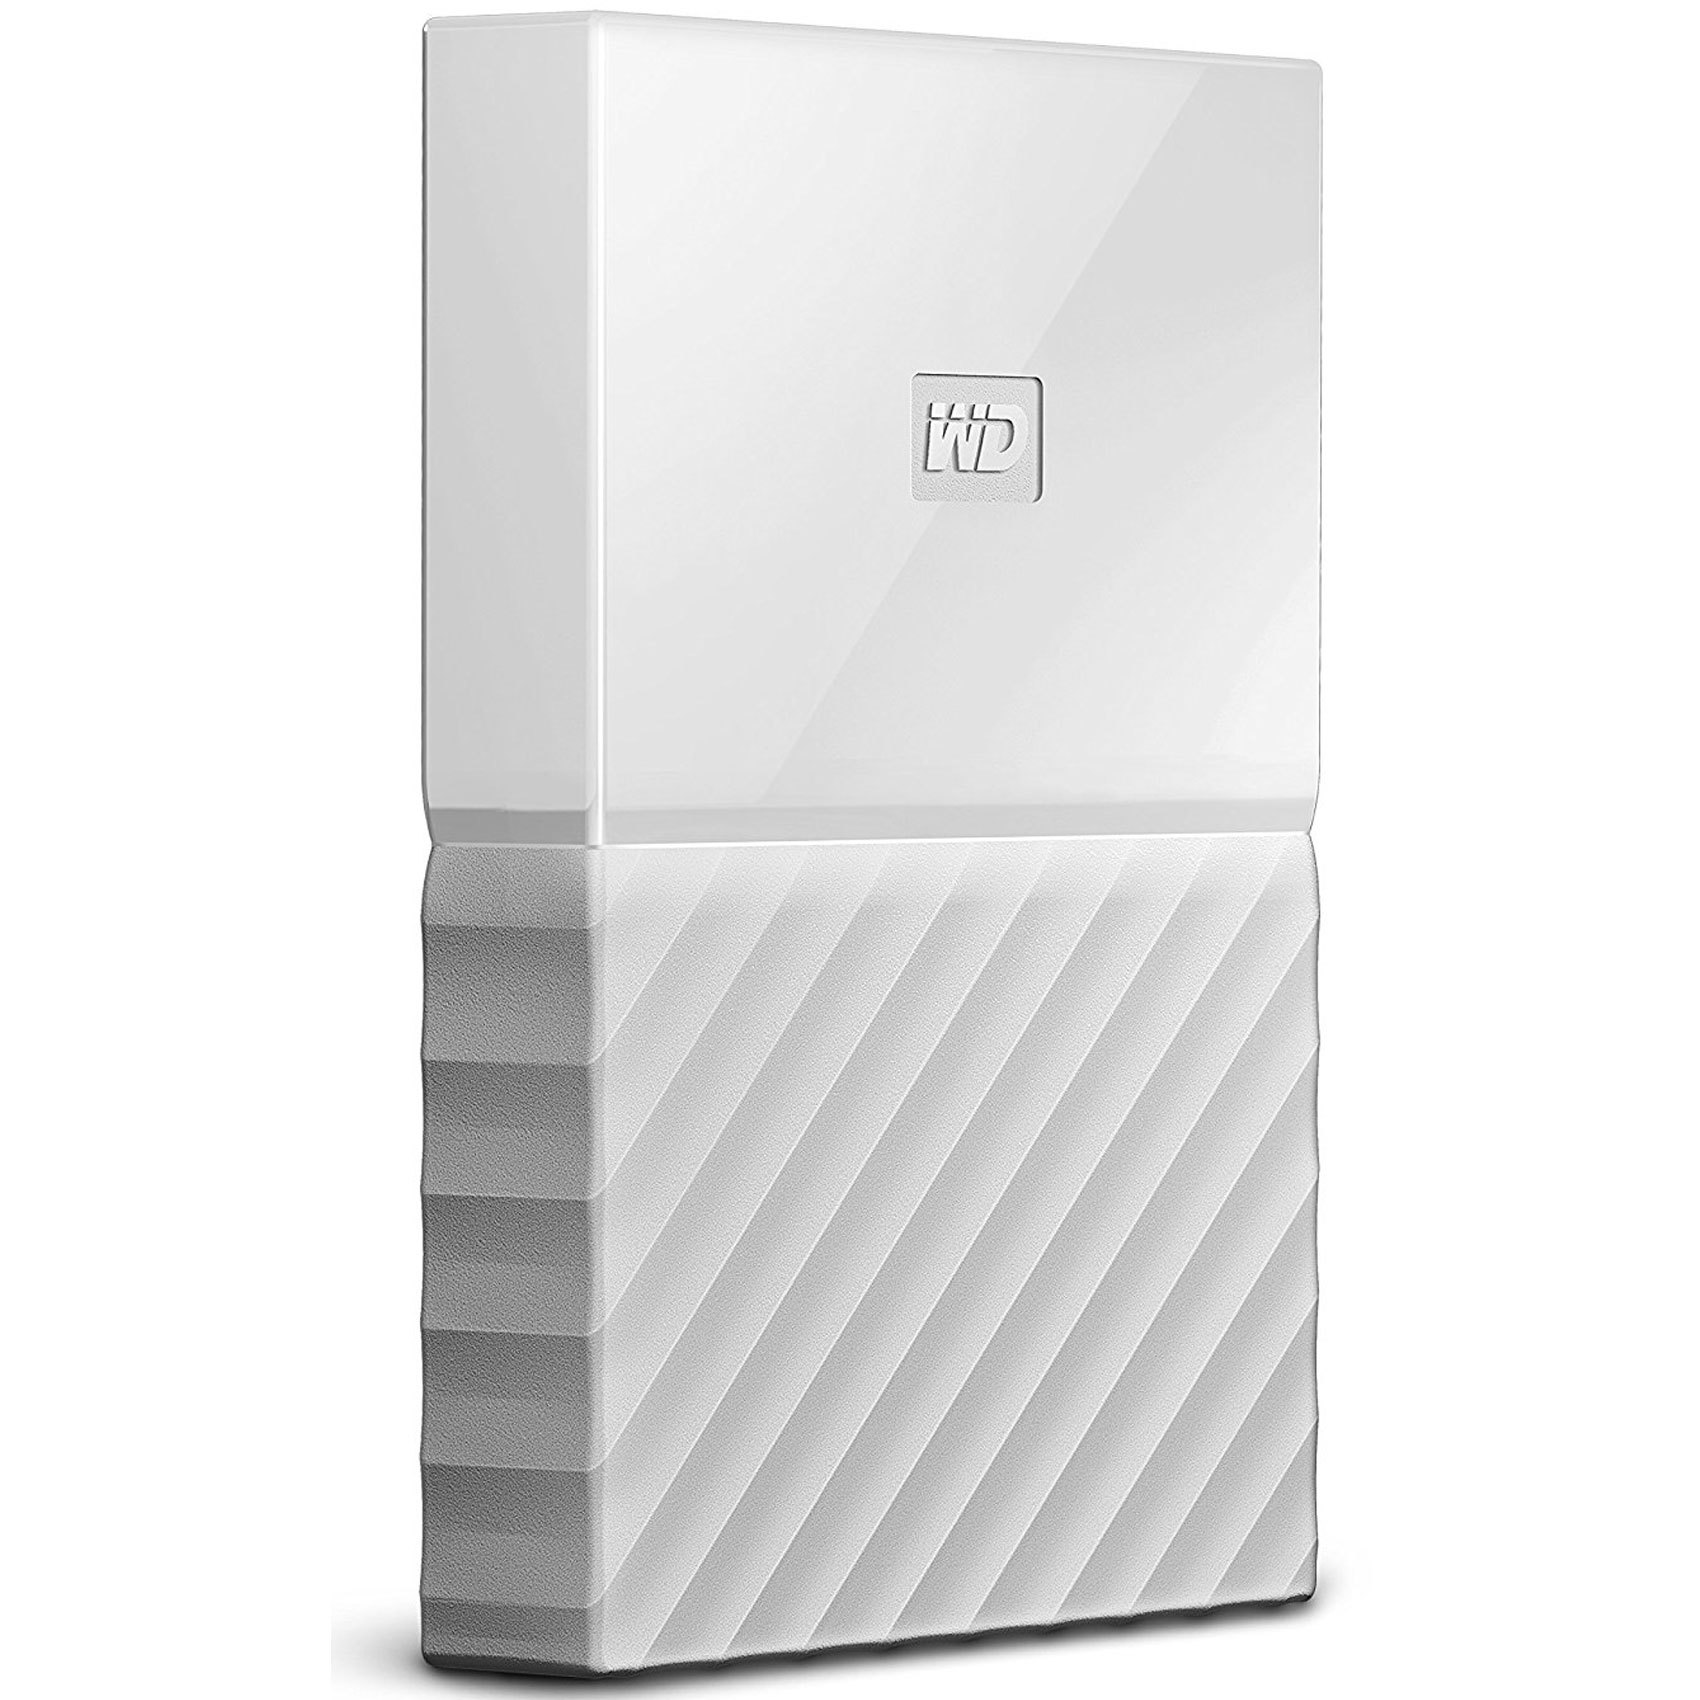 WD HDD 1TB PASSPORT WH WW